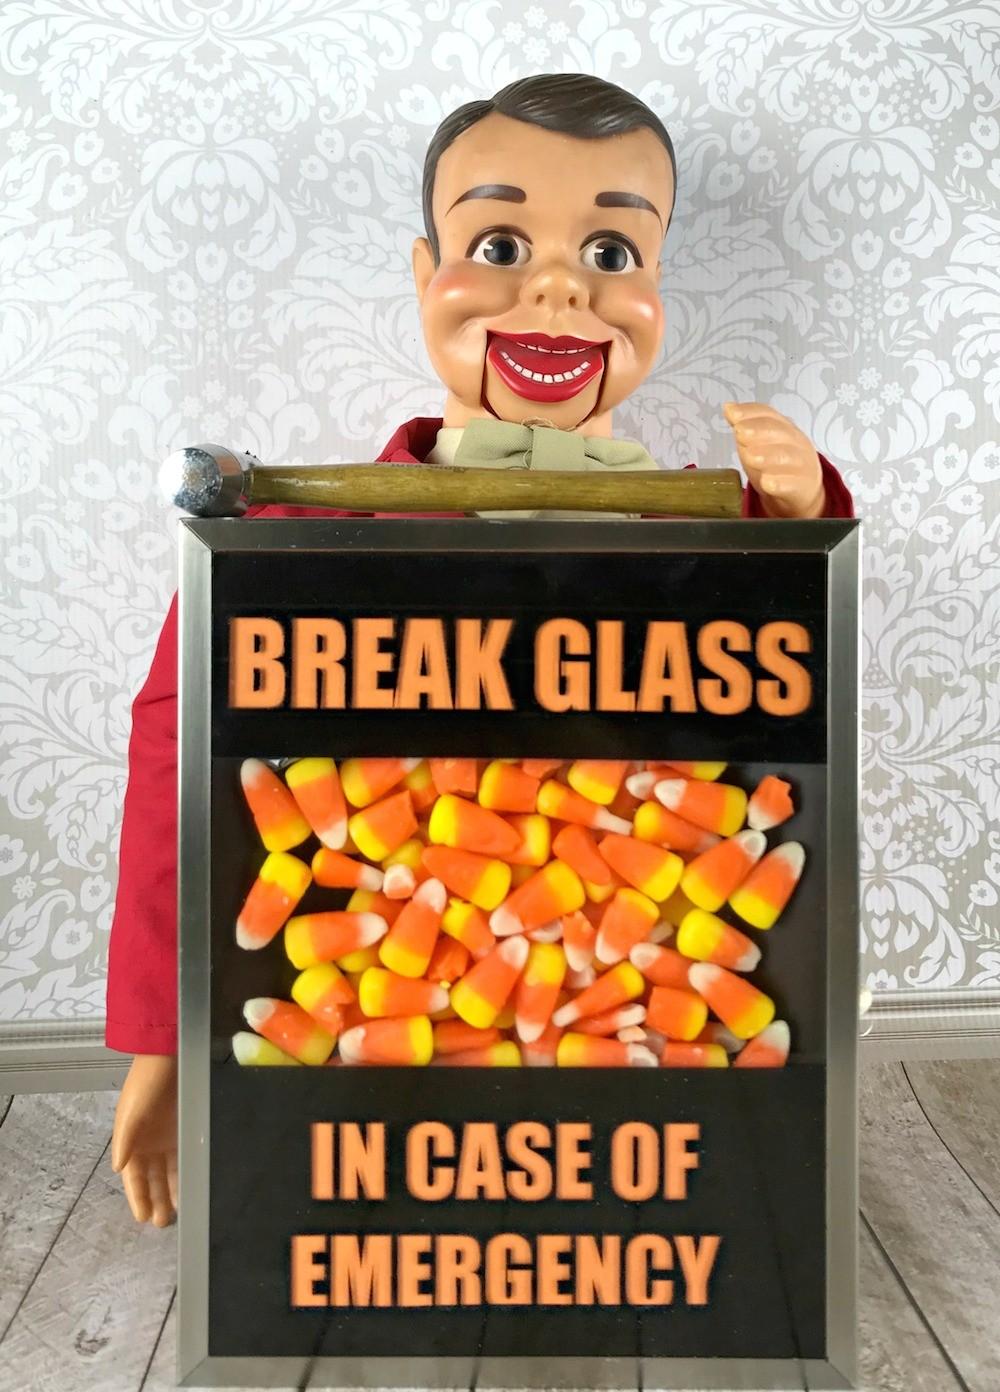 photo regarding In Case of Emergency Break Glass Printable referred to as sweet Archives - Morenas Corner